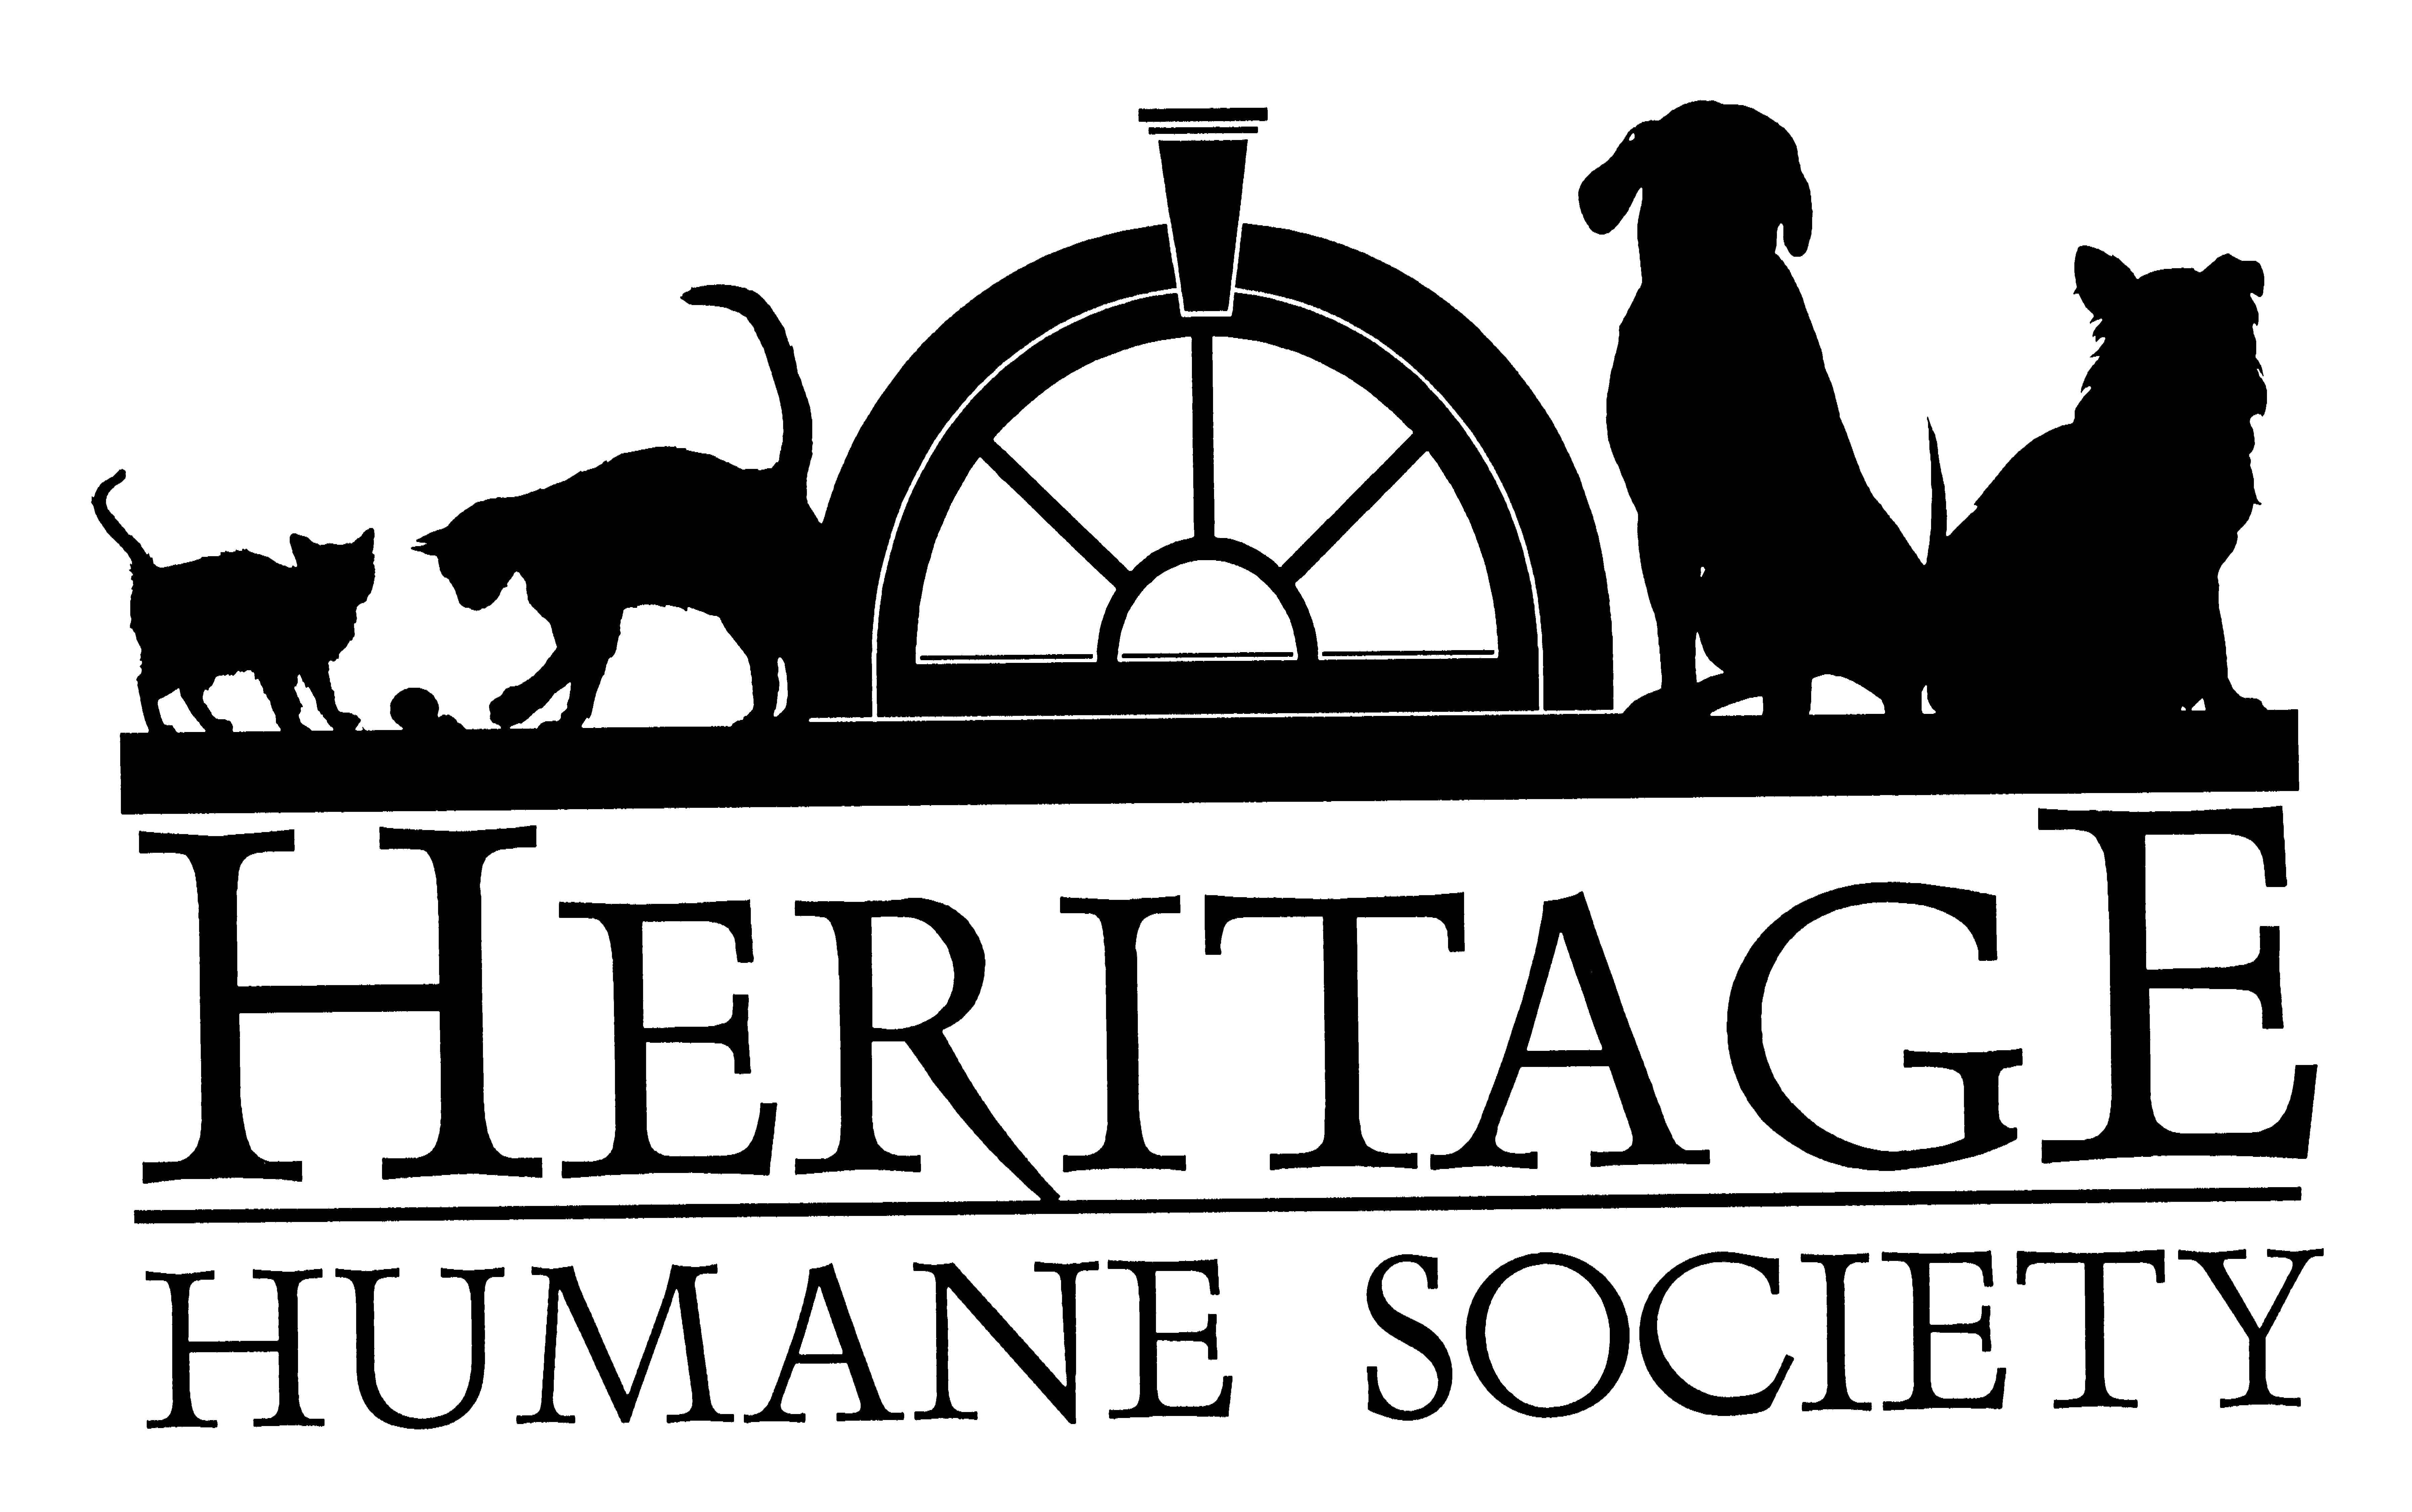 www.heritagehumanesociety.org